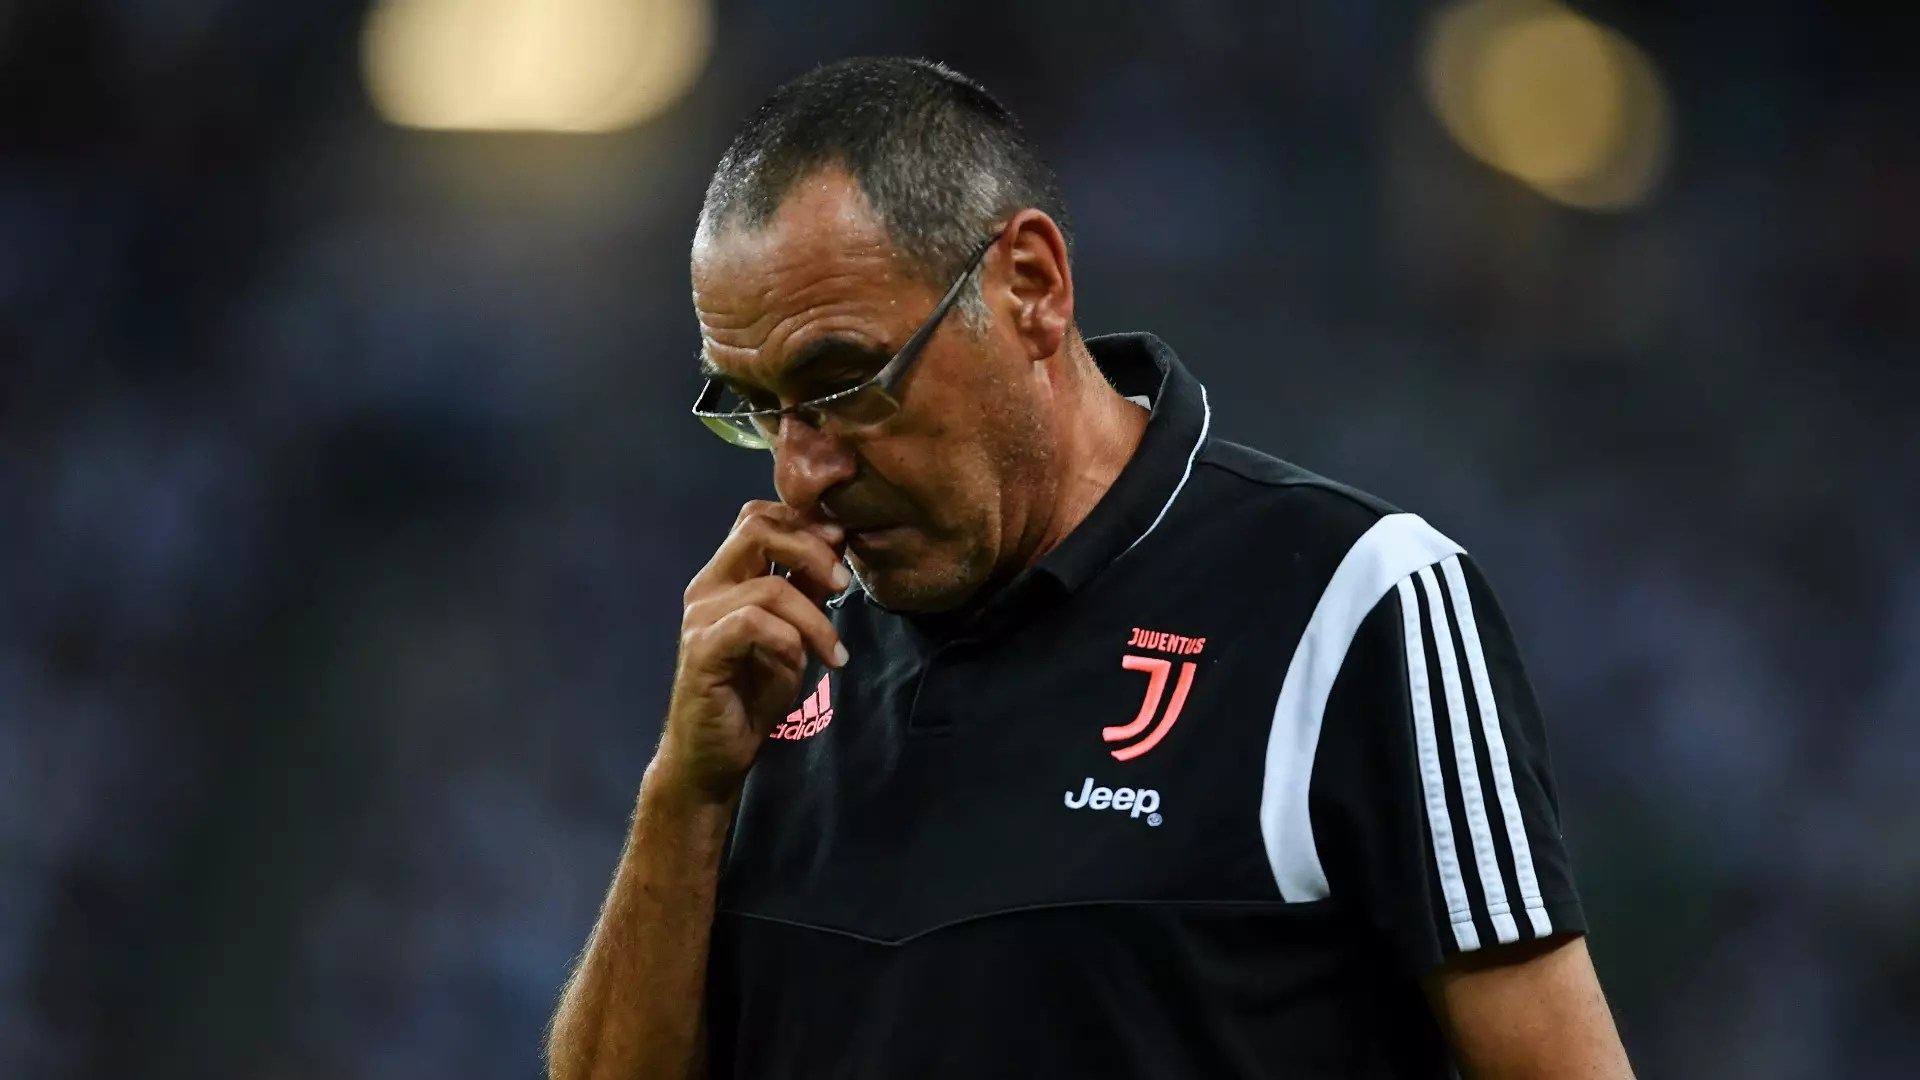 Após eliminação na Champions, Juventus demite Maurizio Sarri